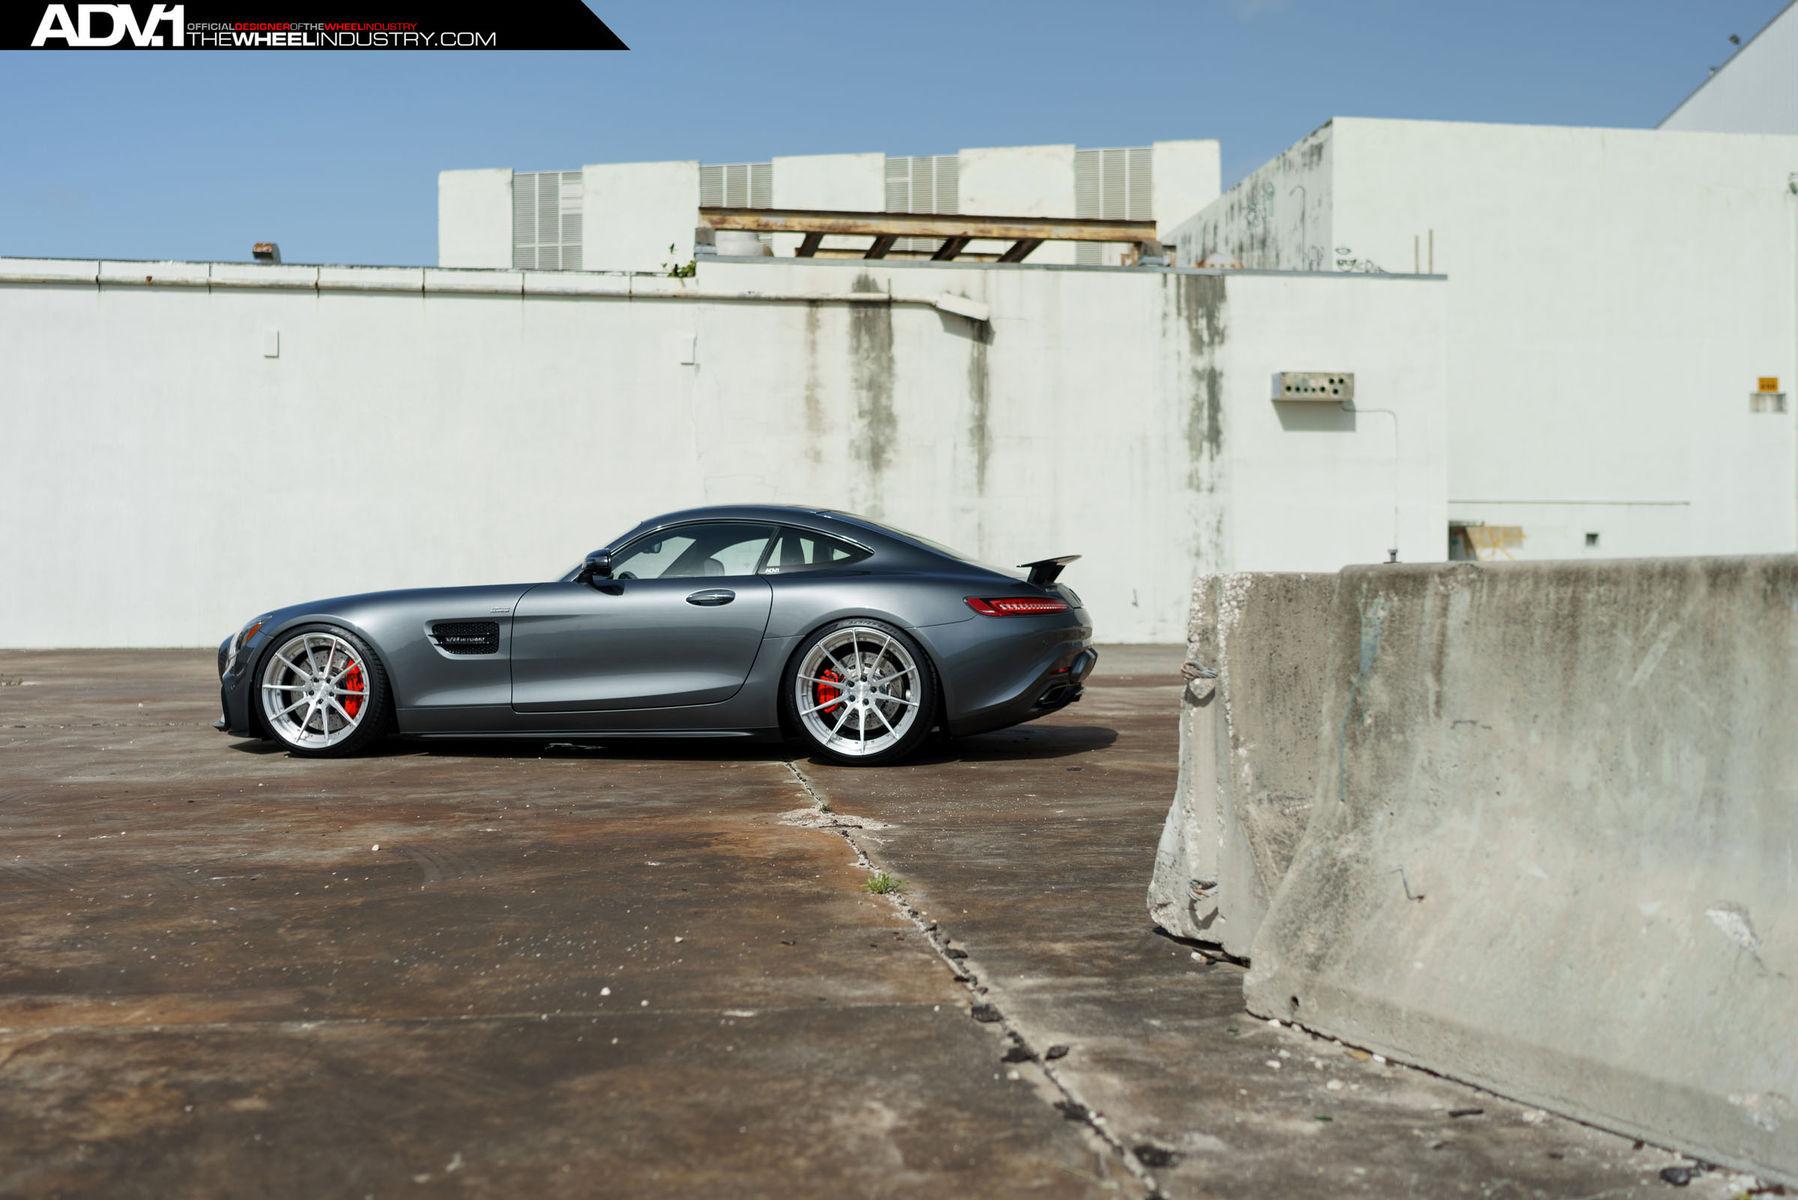 2015 Mercedes-Benz  | Mercedes AMG GTS Edition 1